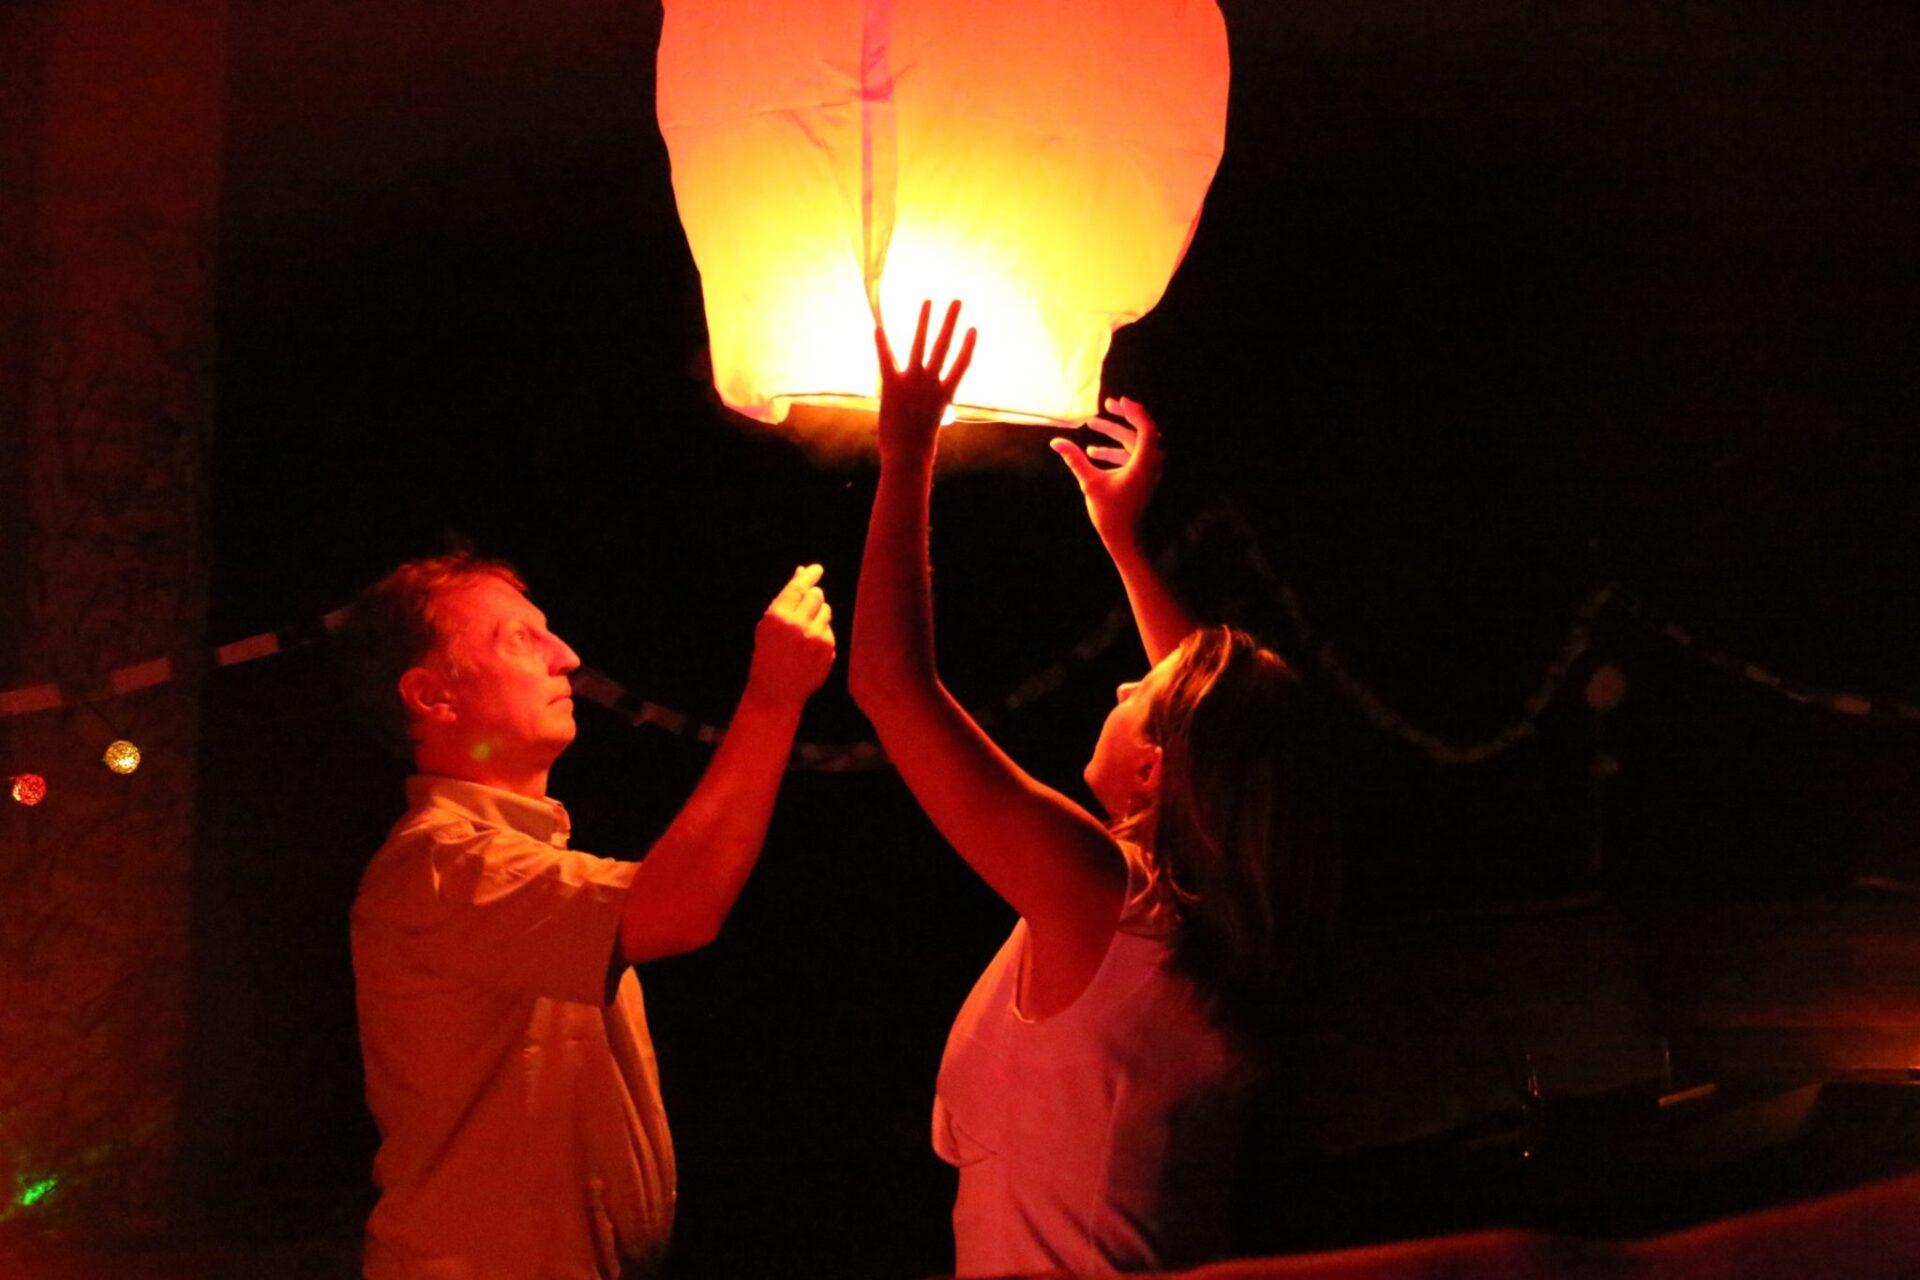 Sending the lanterns off